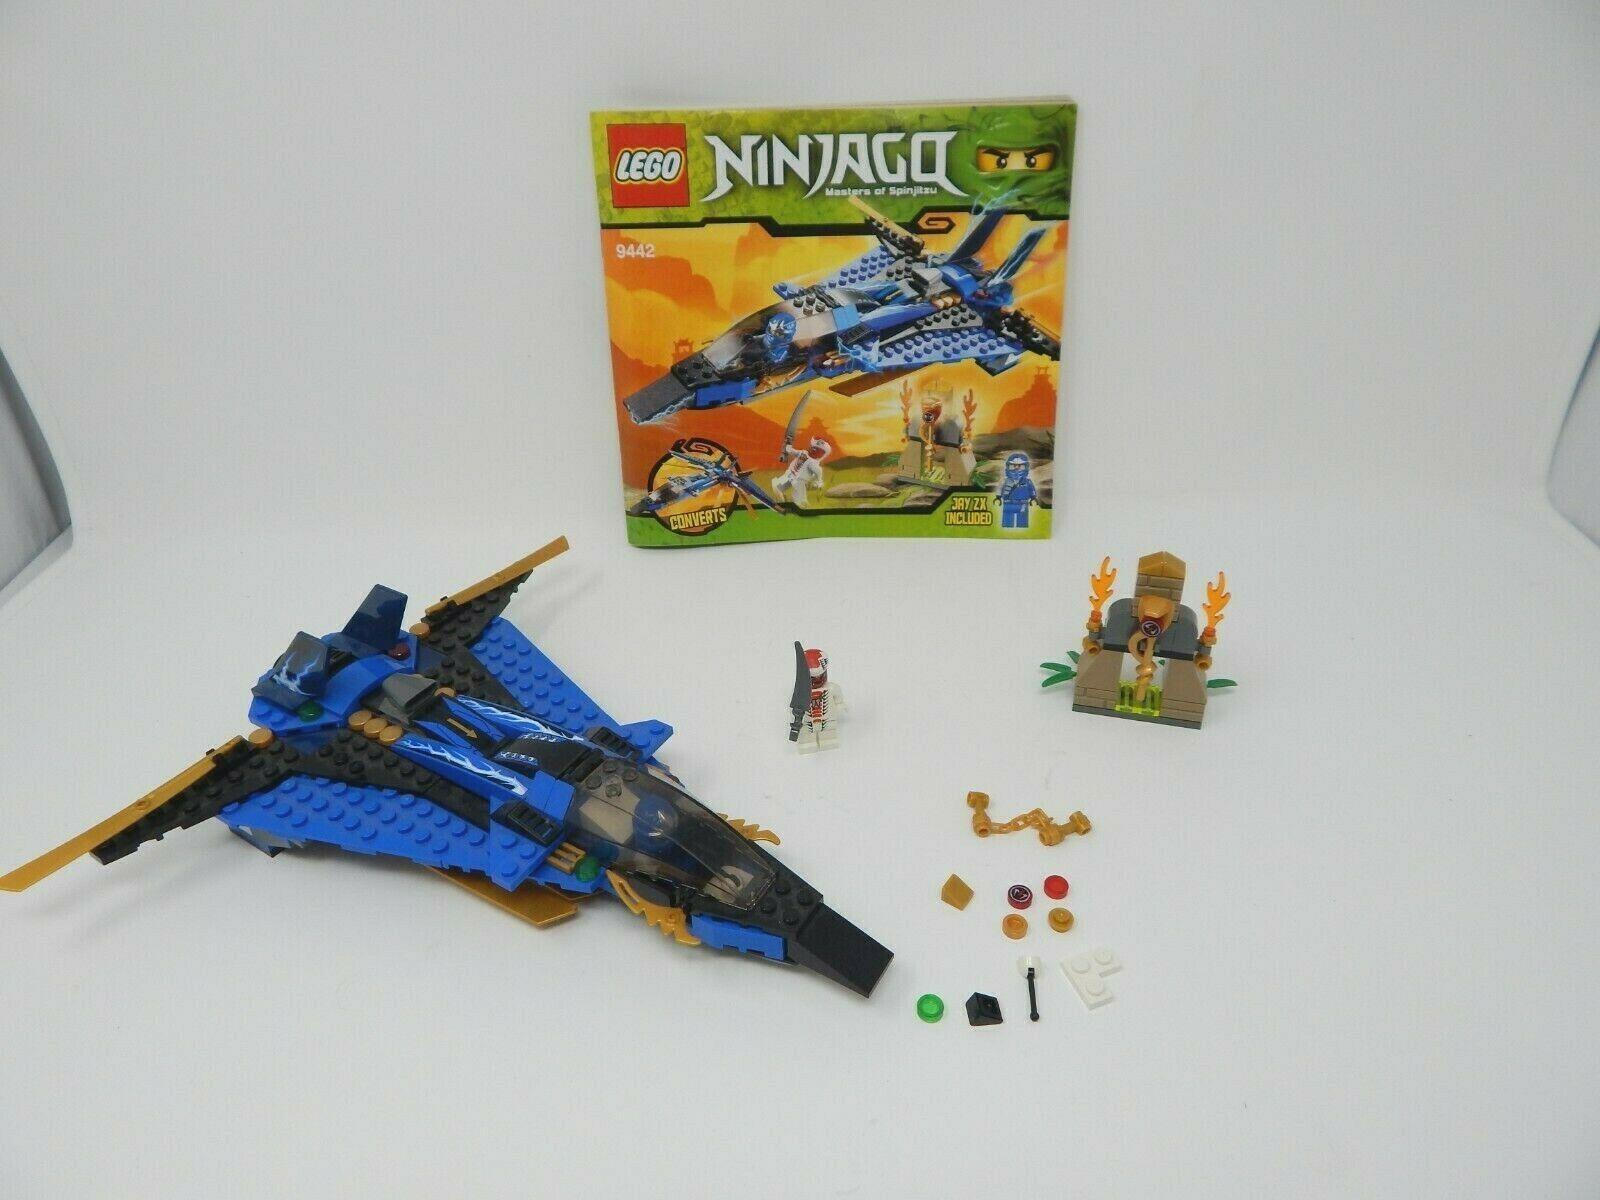 50 Fighter And Items Ninjago Lego Storm Jay's 9442 Similar 5jcqL34ARS